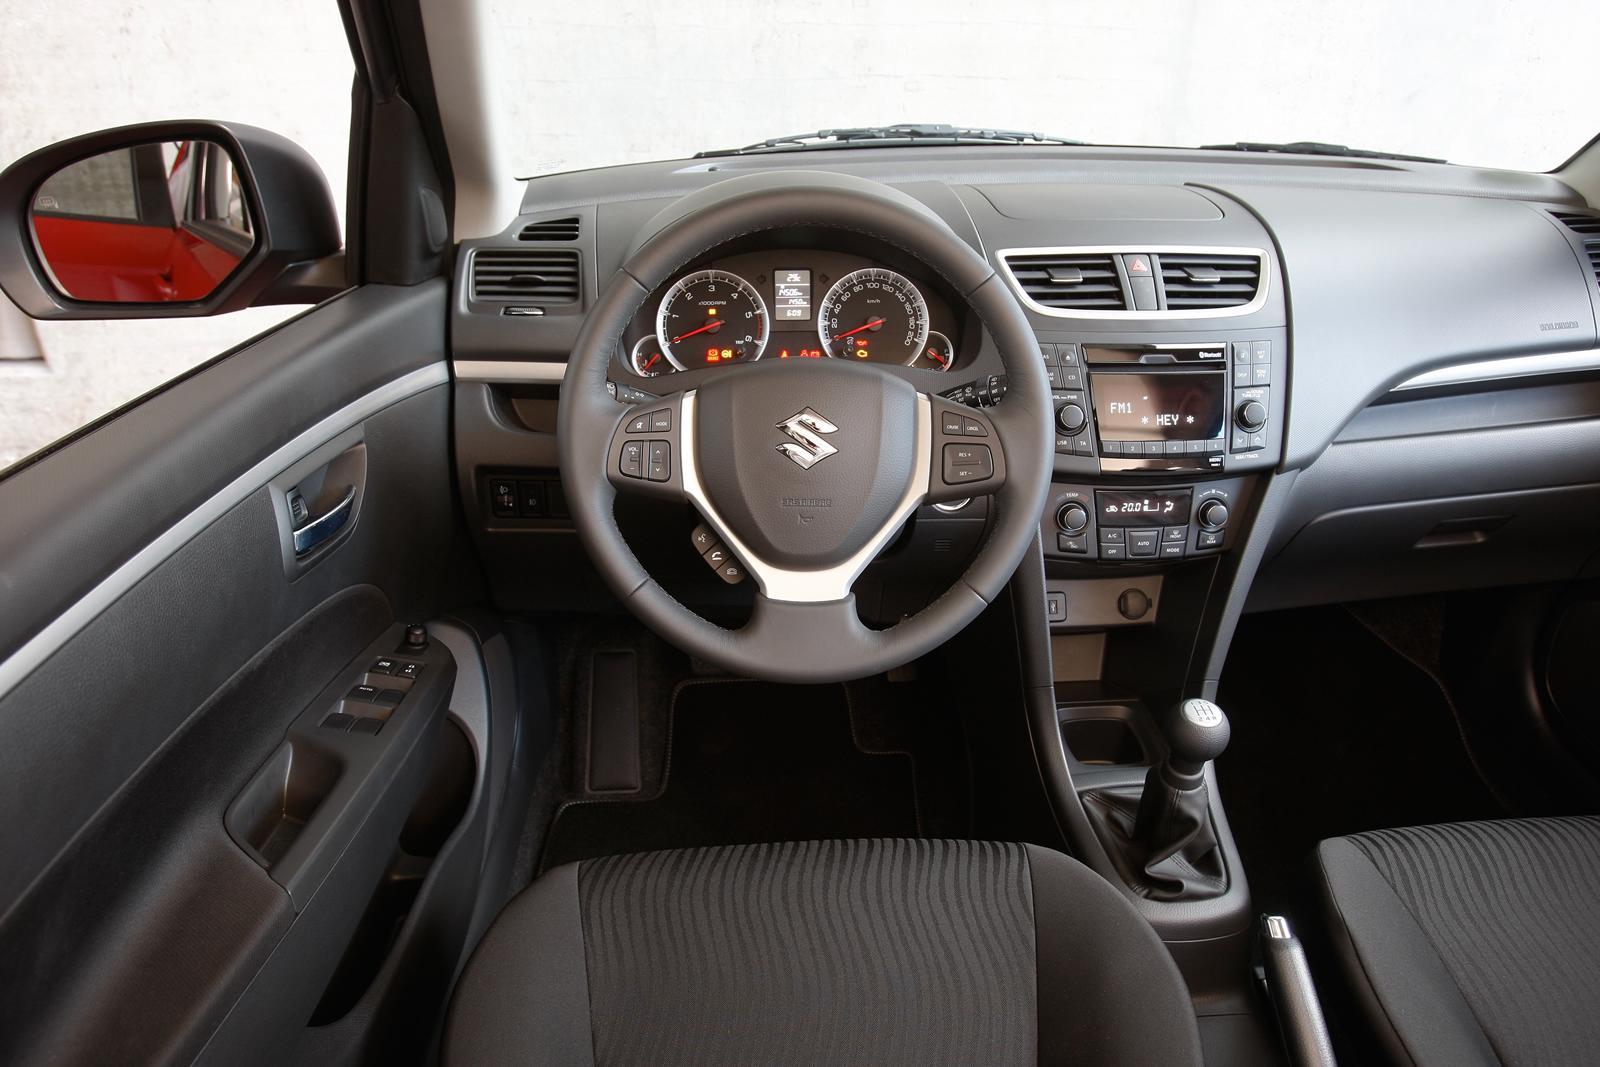 Infiniti Cars For Sale >> SUZUKI Swift 3 Doors - 2010, 2011, 2012, 2013 - autoevolution